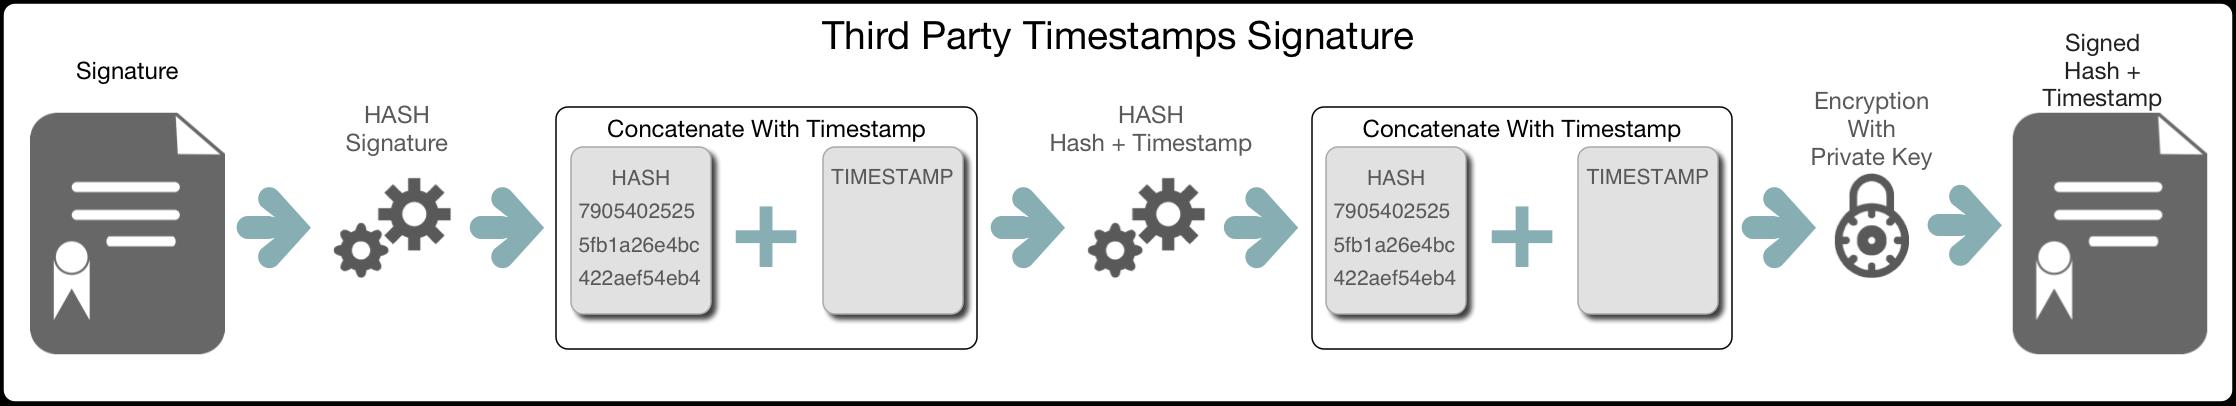 Adding Timestamp Information